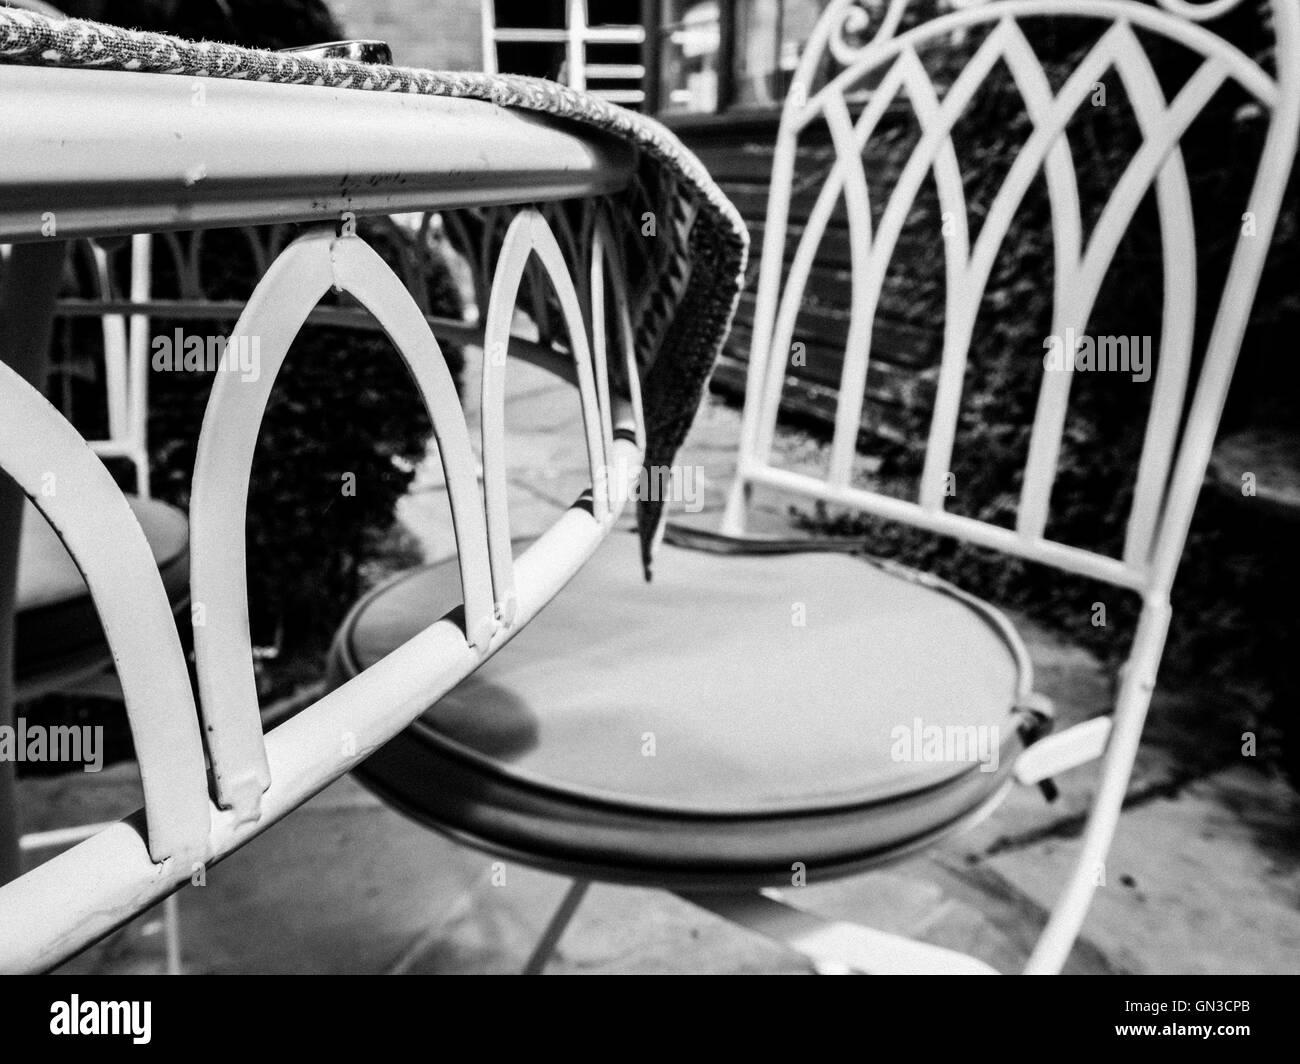 Garden Seat Metal Stockfotos & Garden Seat Metal Bilder - Alamy